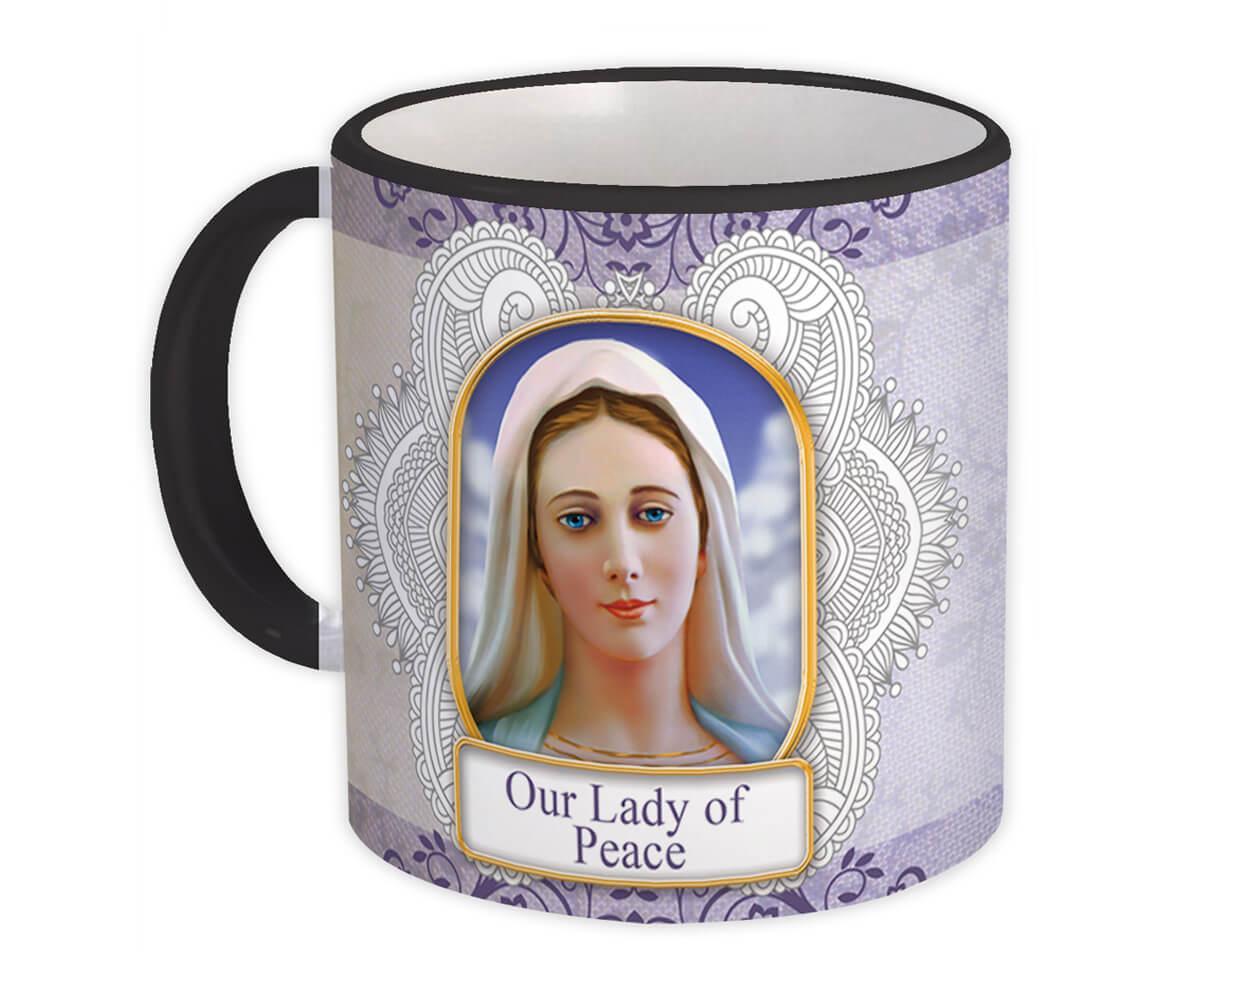 Our Lady of Peace : Gift Mug Catholic Religious Virgin Mary Mother of God